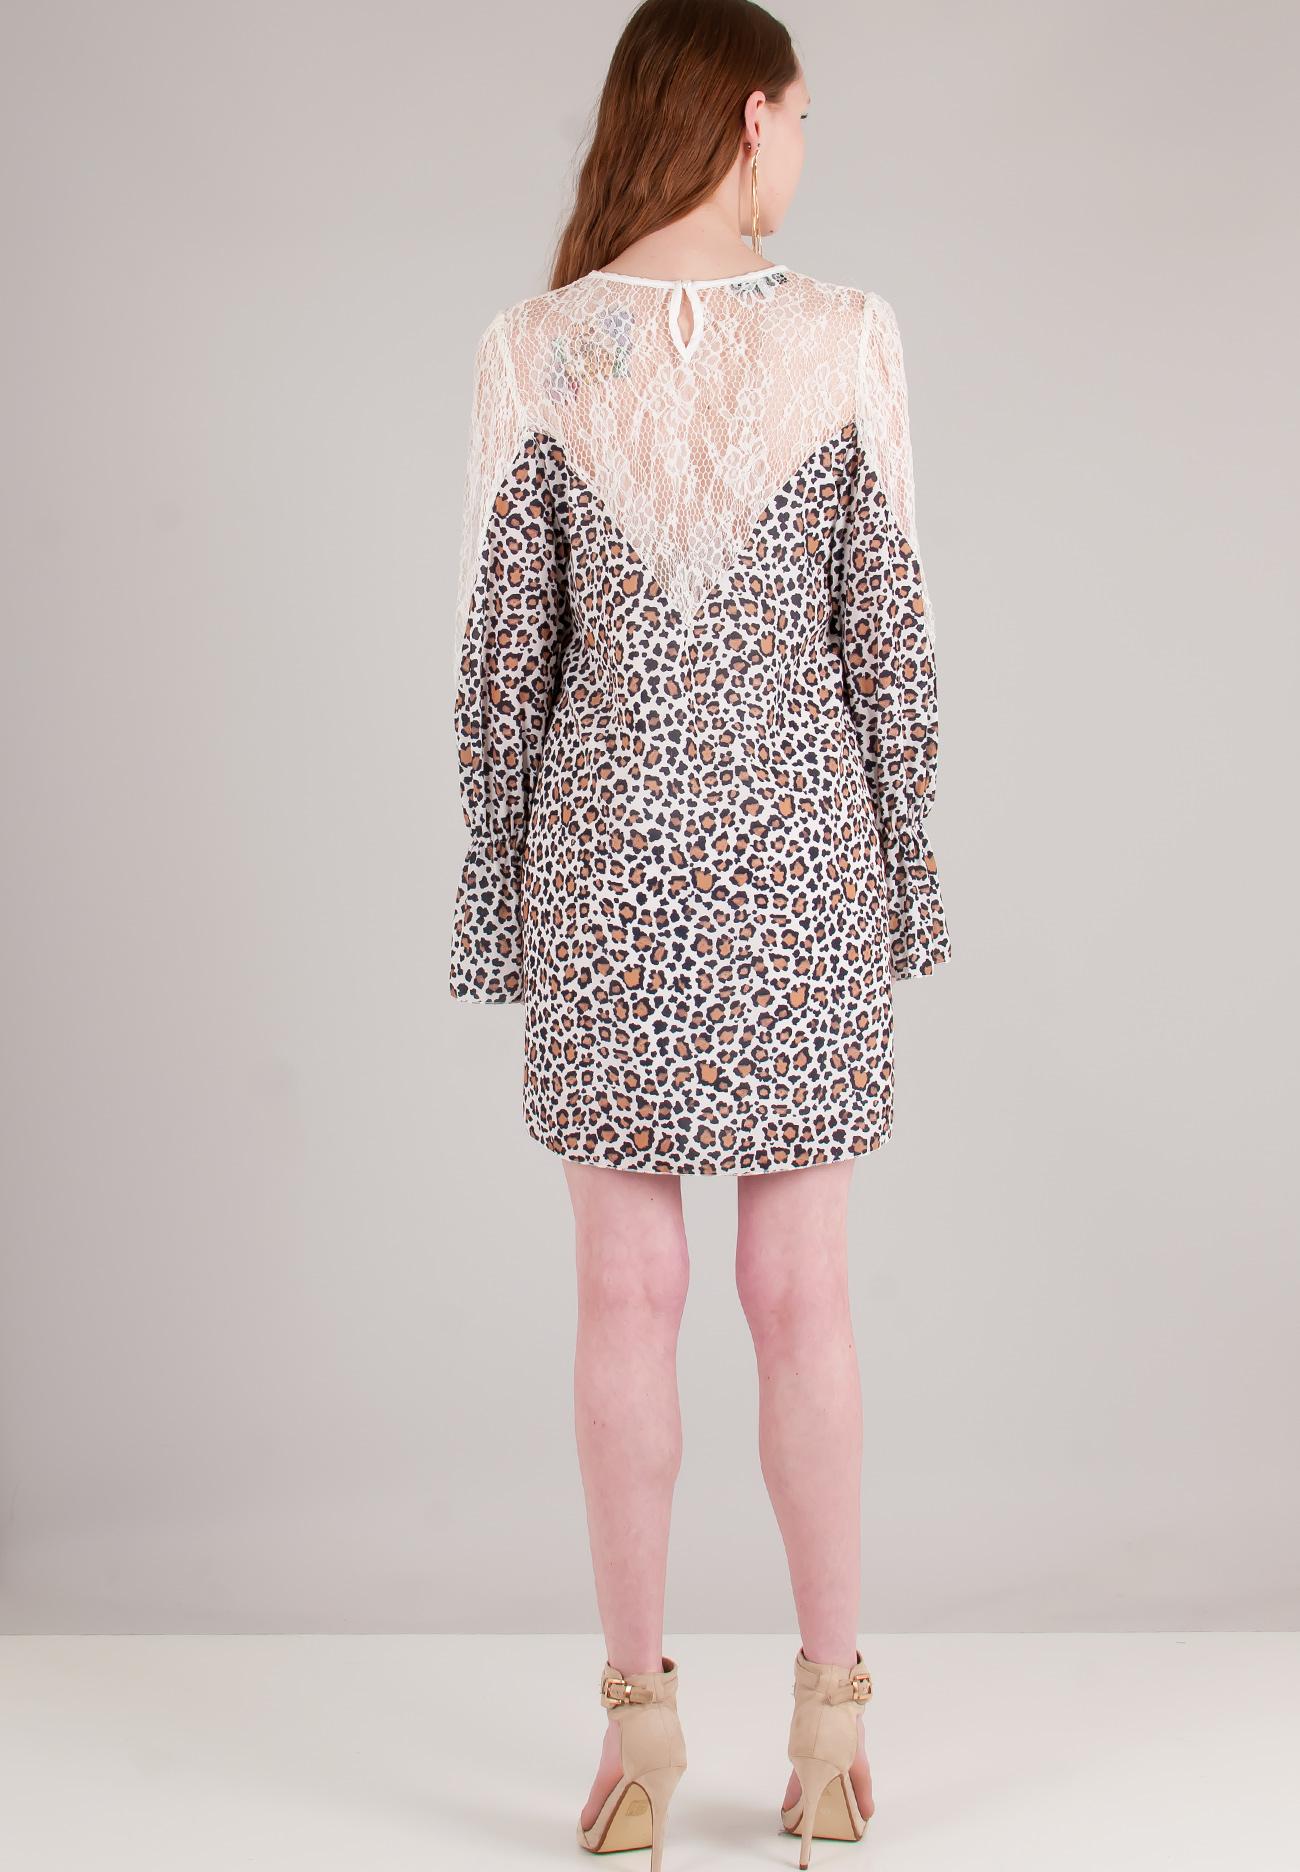 Animal print φόρεμα με λεπτομέρειες δαντέλα - ZIC ZAC 58a088dd128